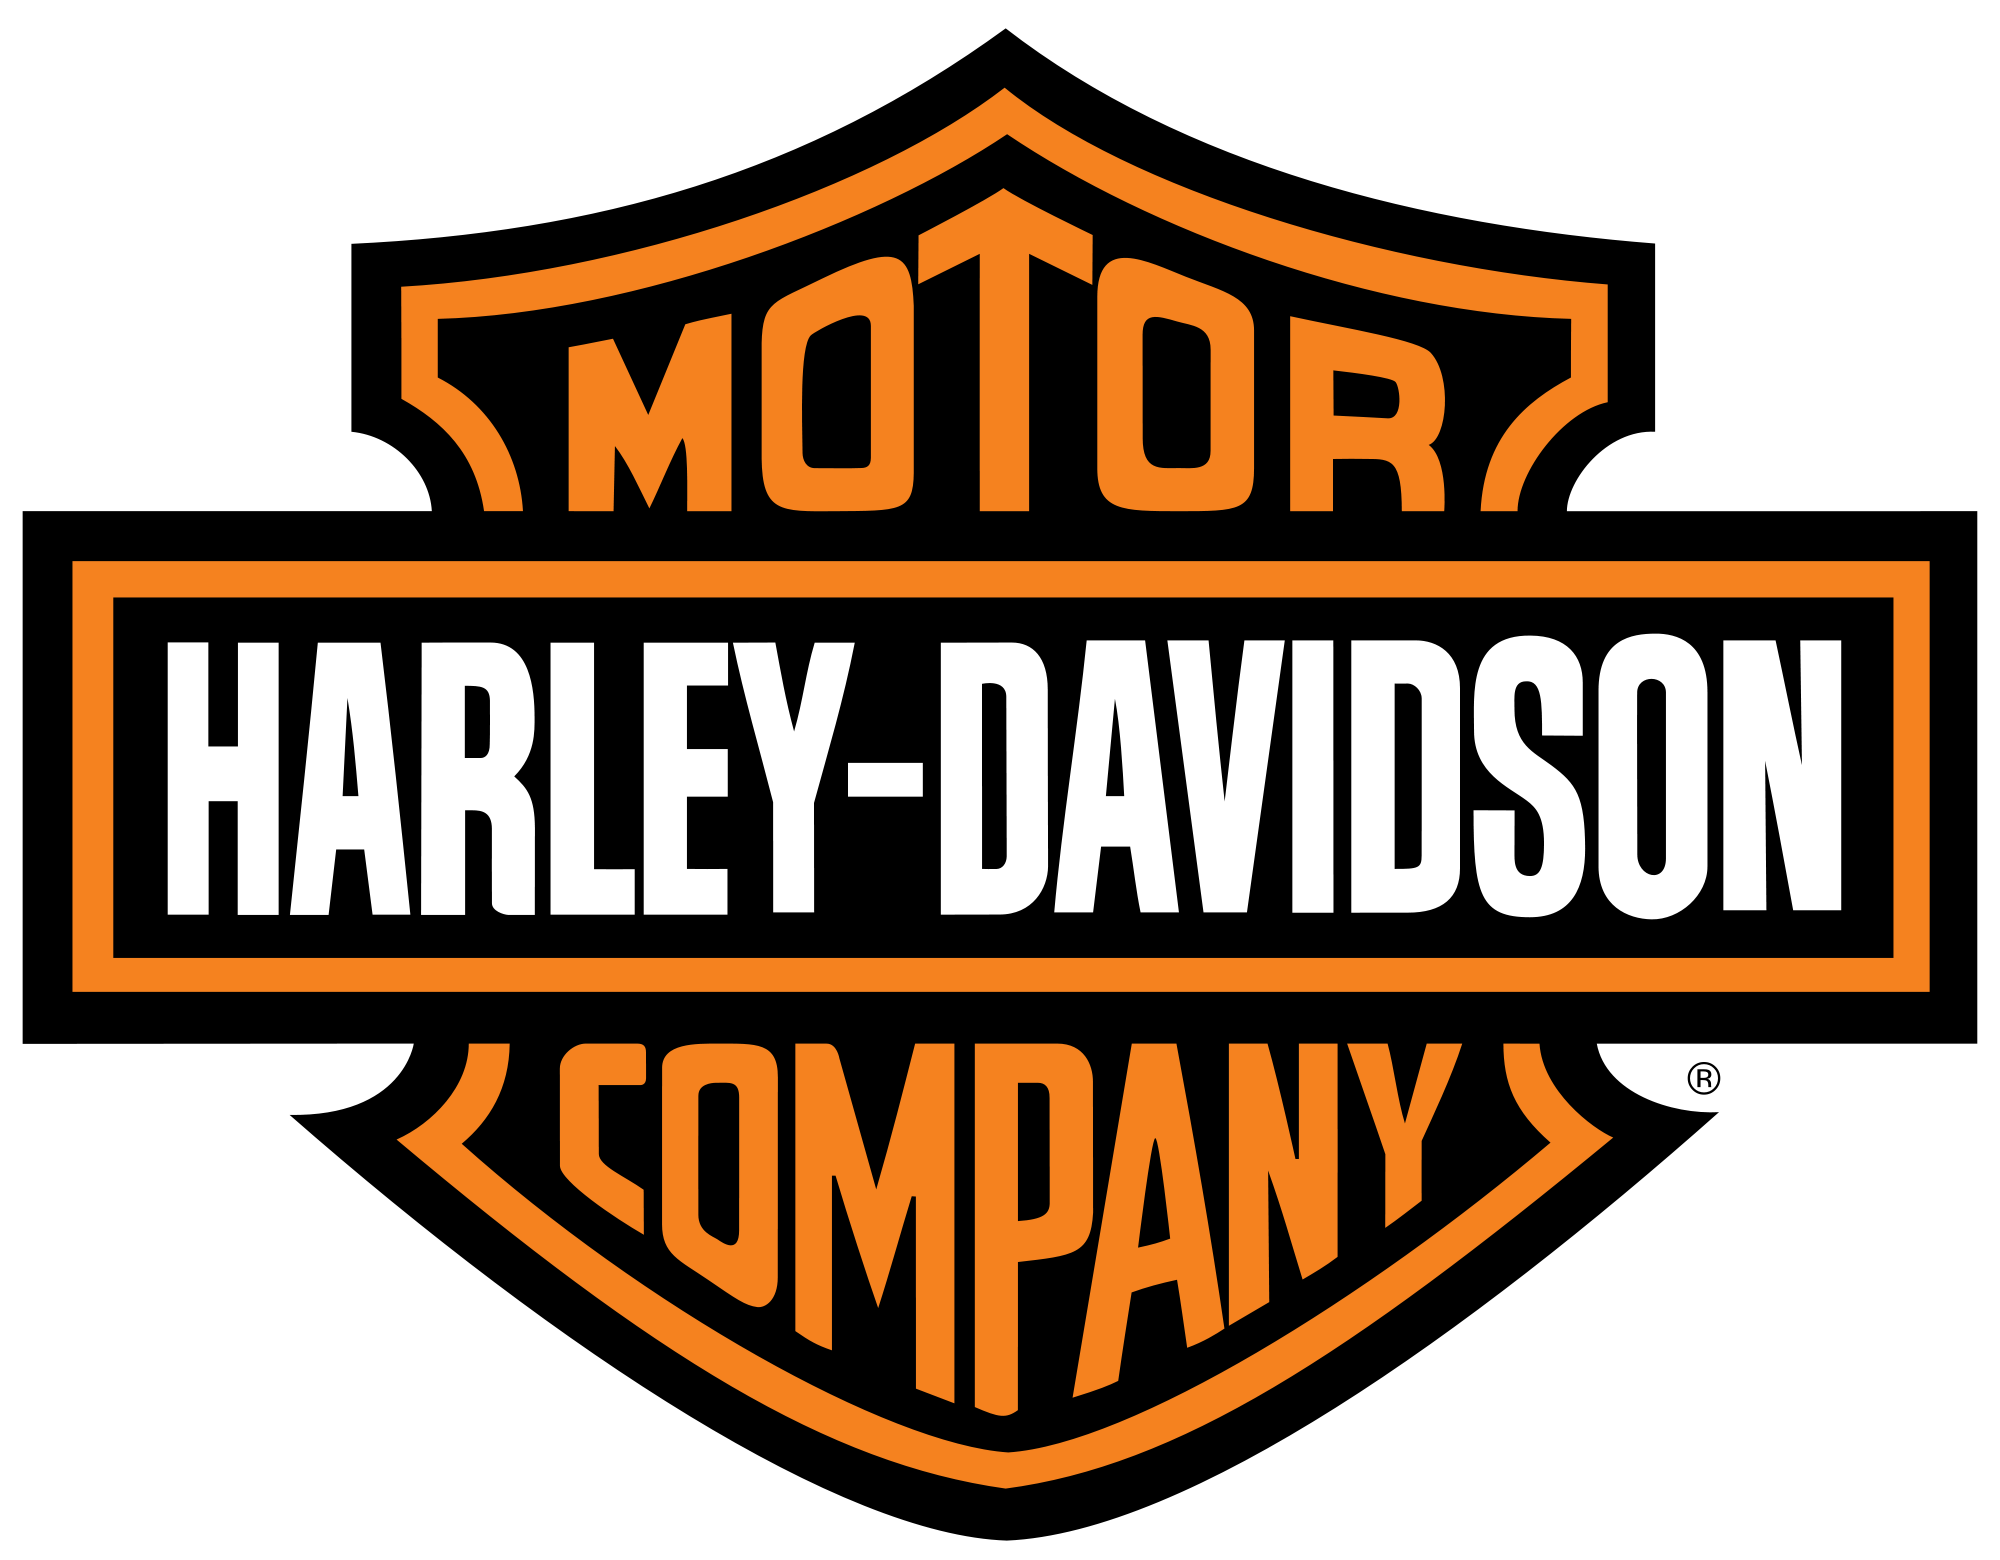 Harley Davidson Logo PNG Image